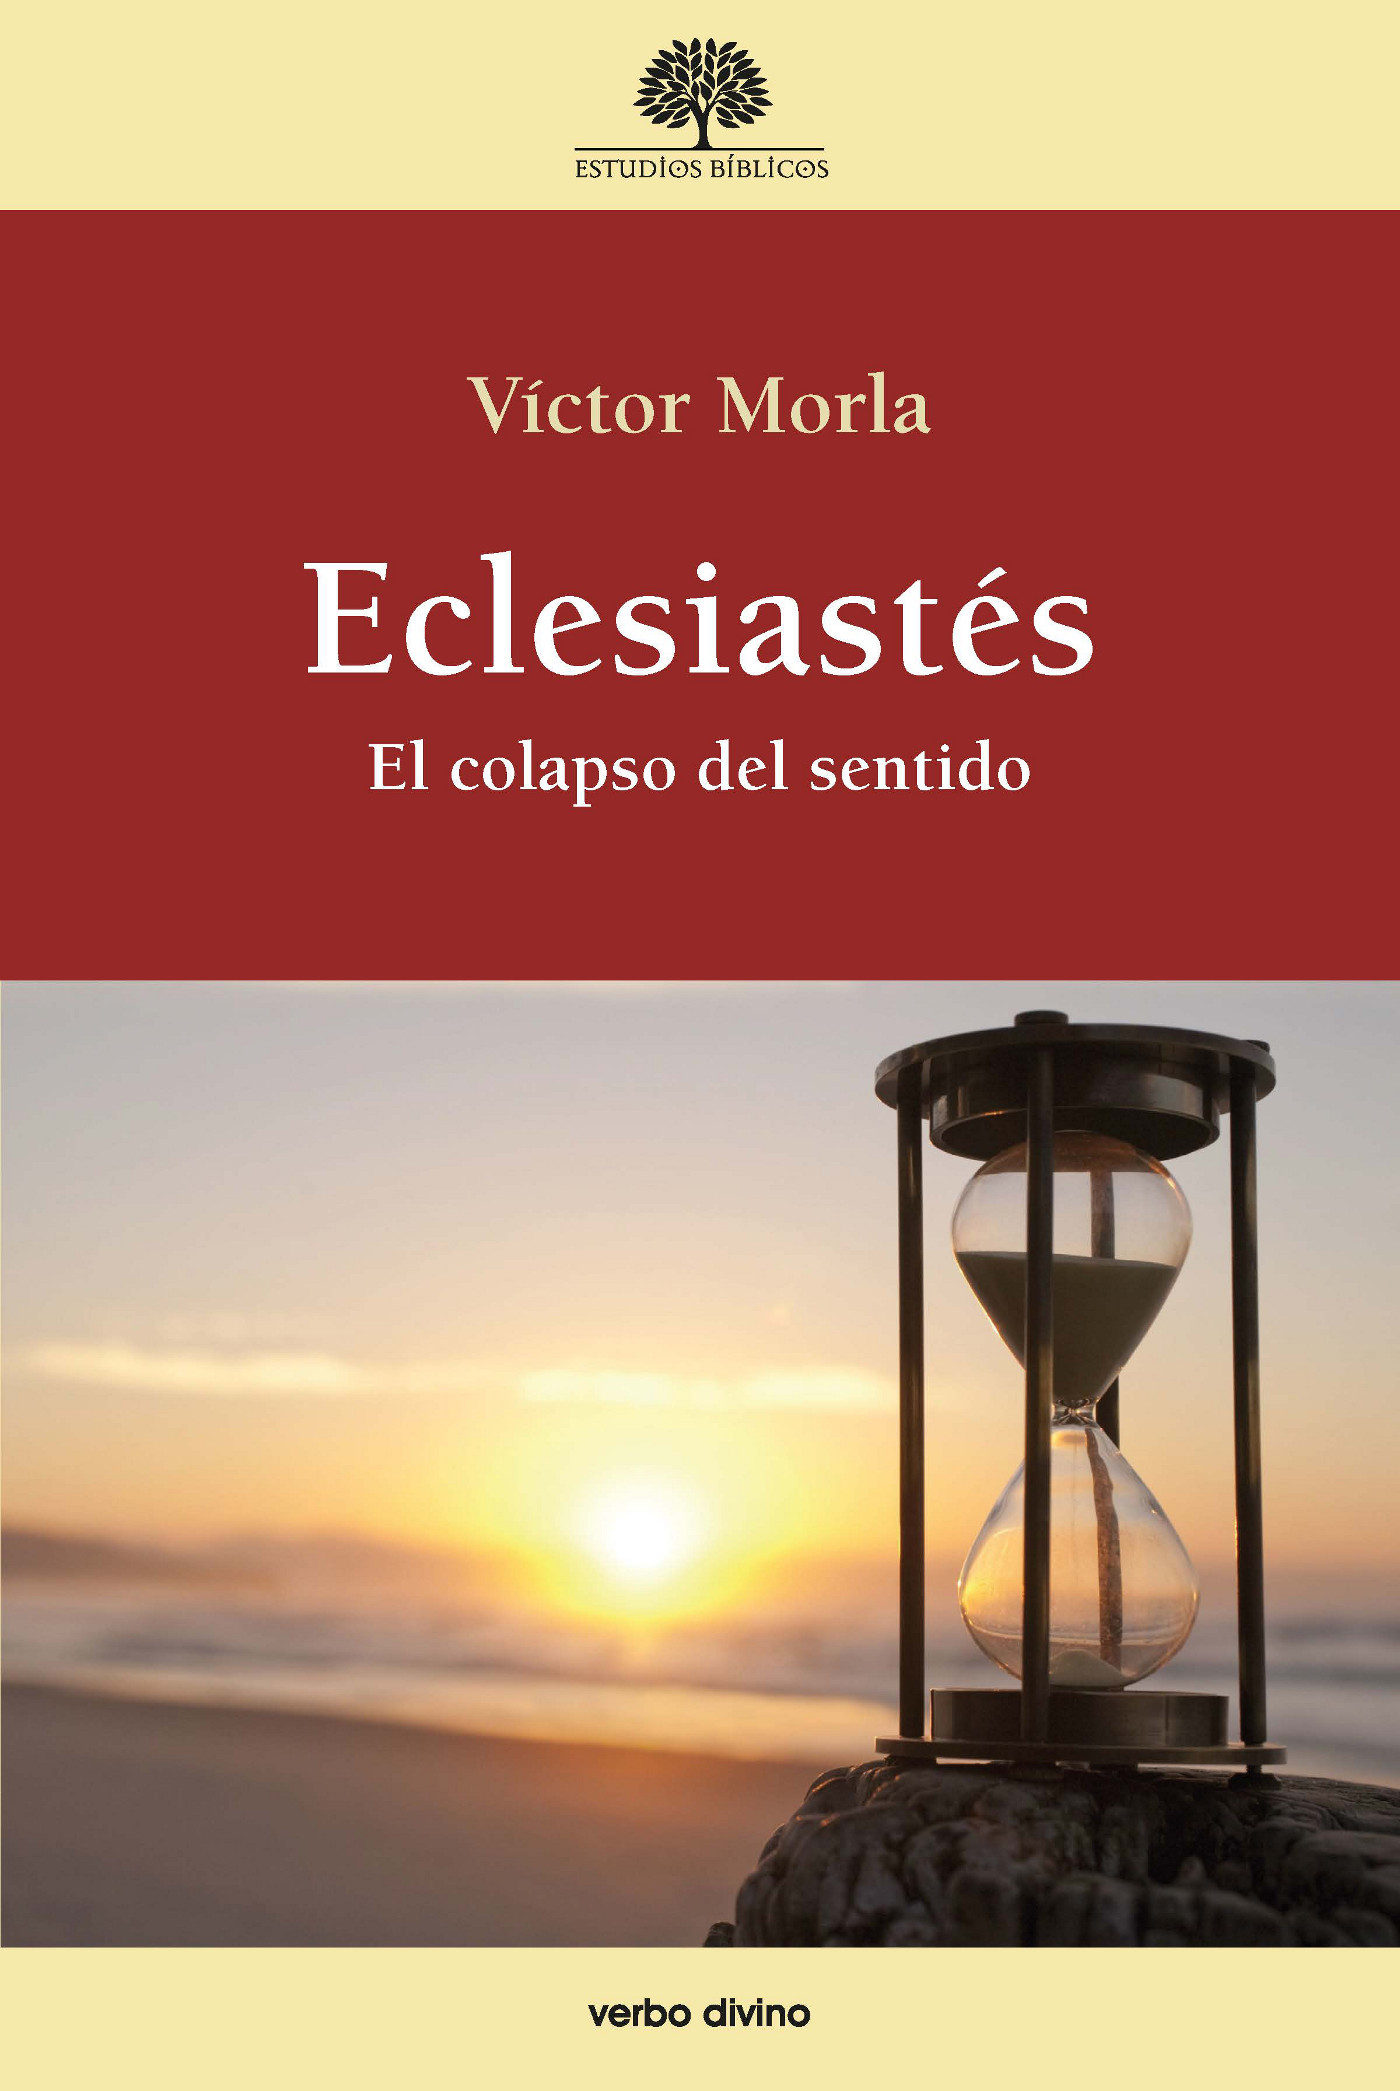 Eclesiastés. El colapso del sentido